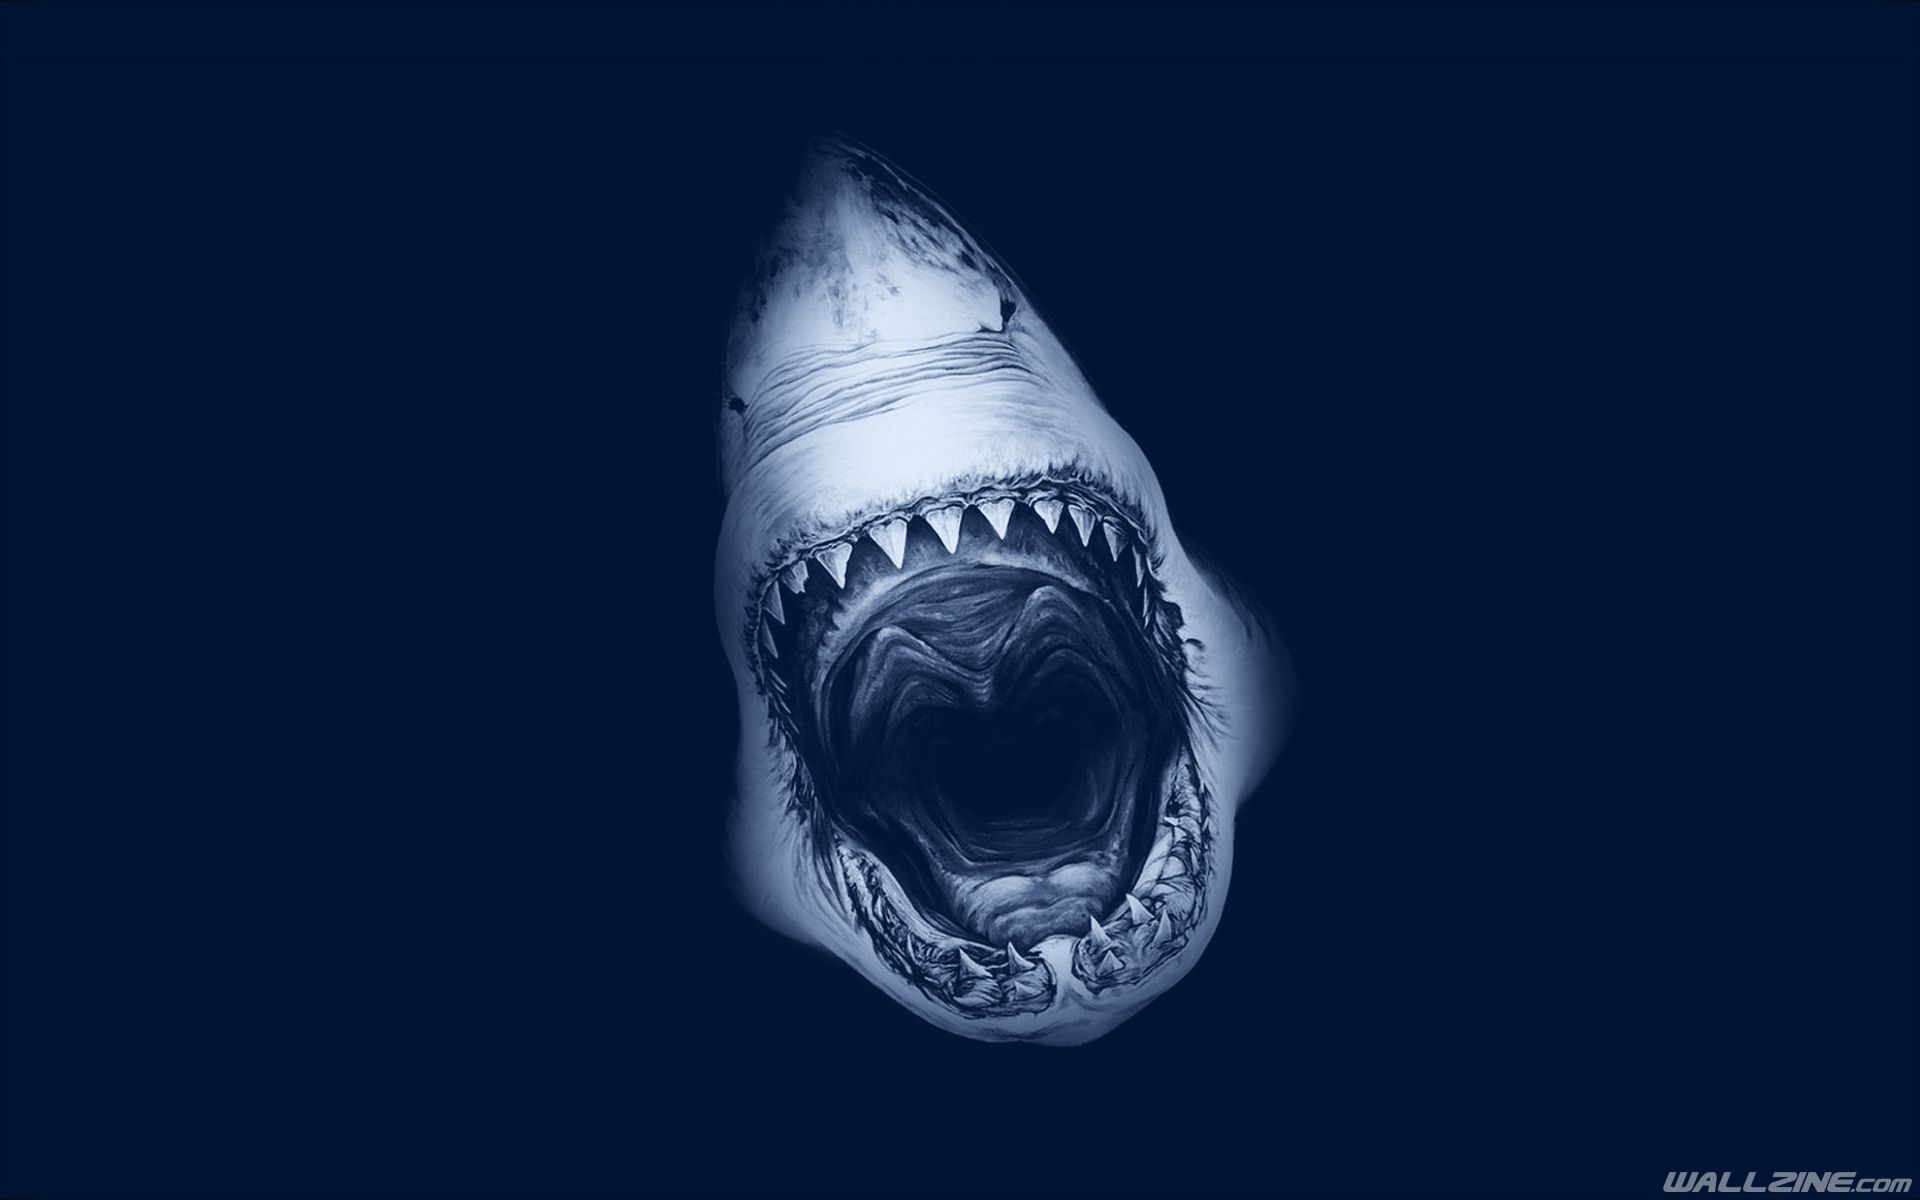 Shark Attack Art Wallpaper Arte Shark Shark Pictures Y